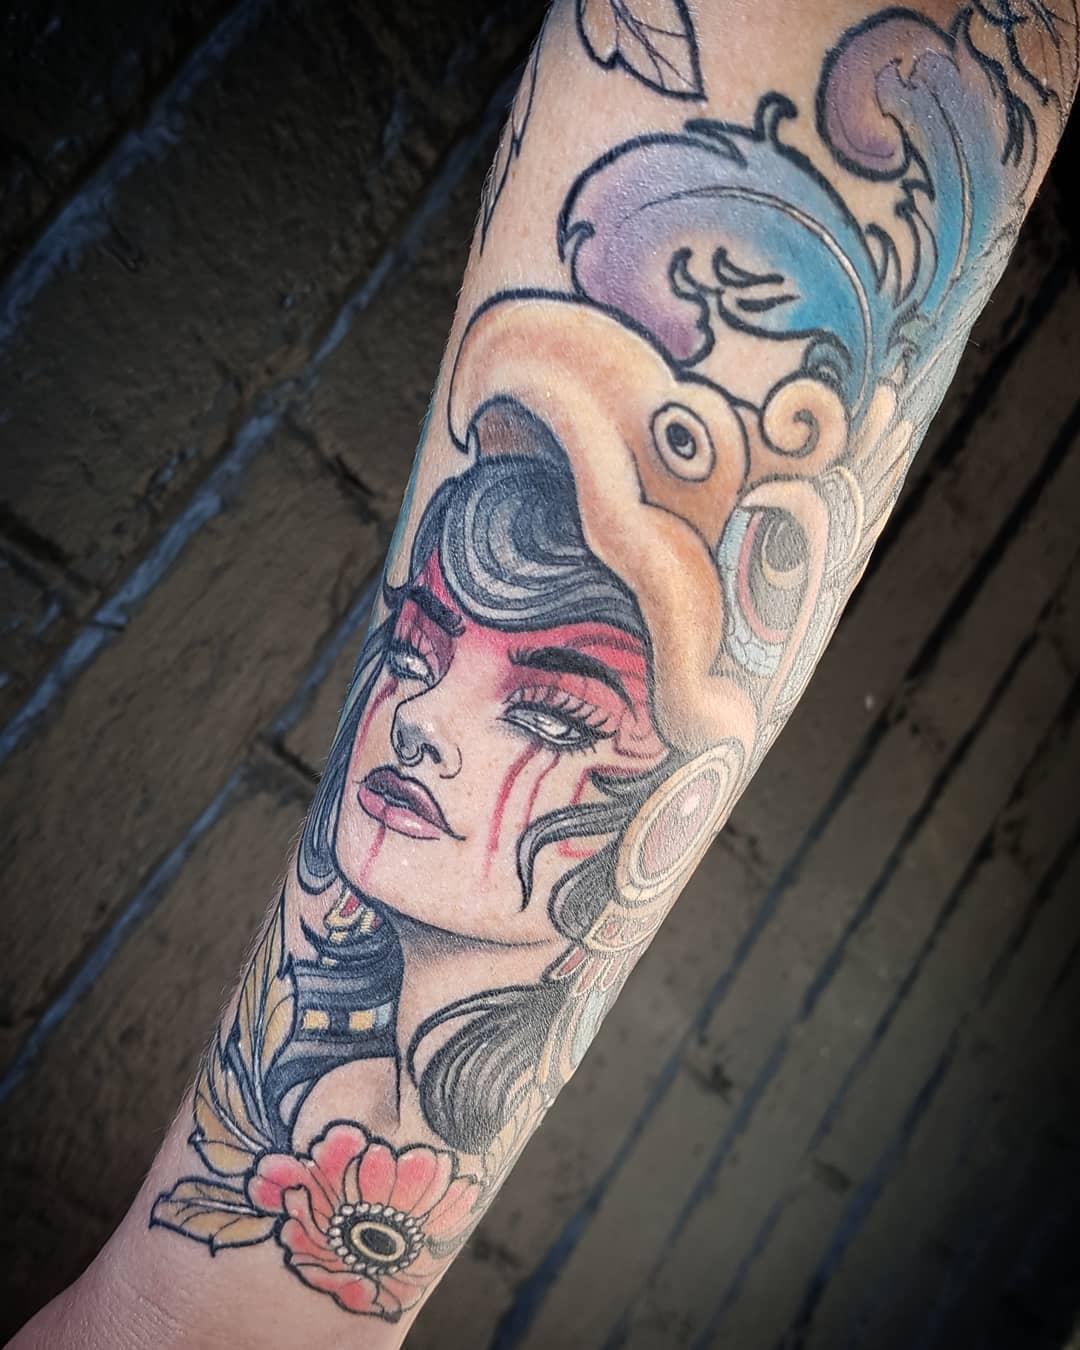 rocio-todisco-johannesburg-tattoo-artist-arm-sleeve